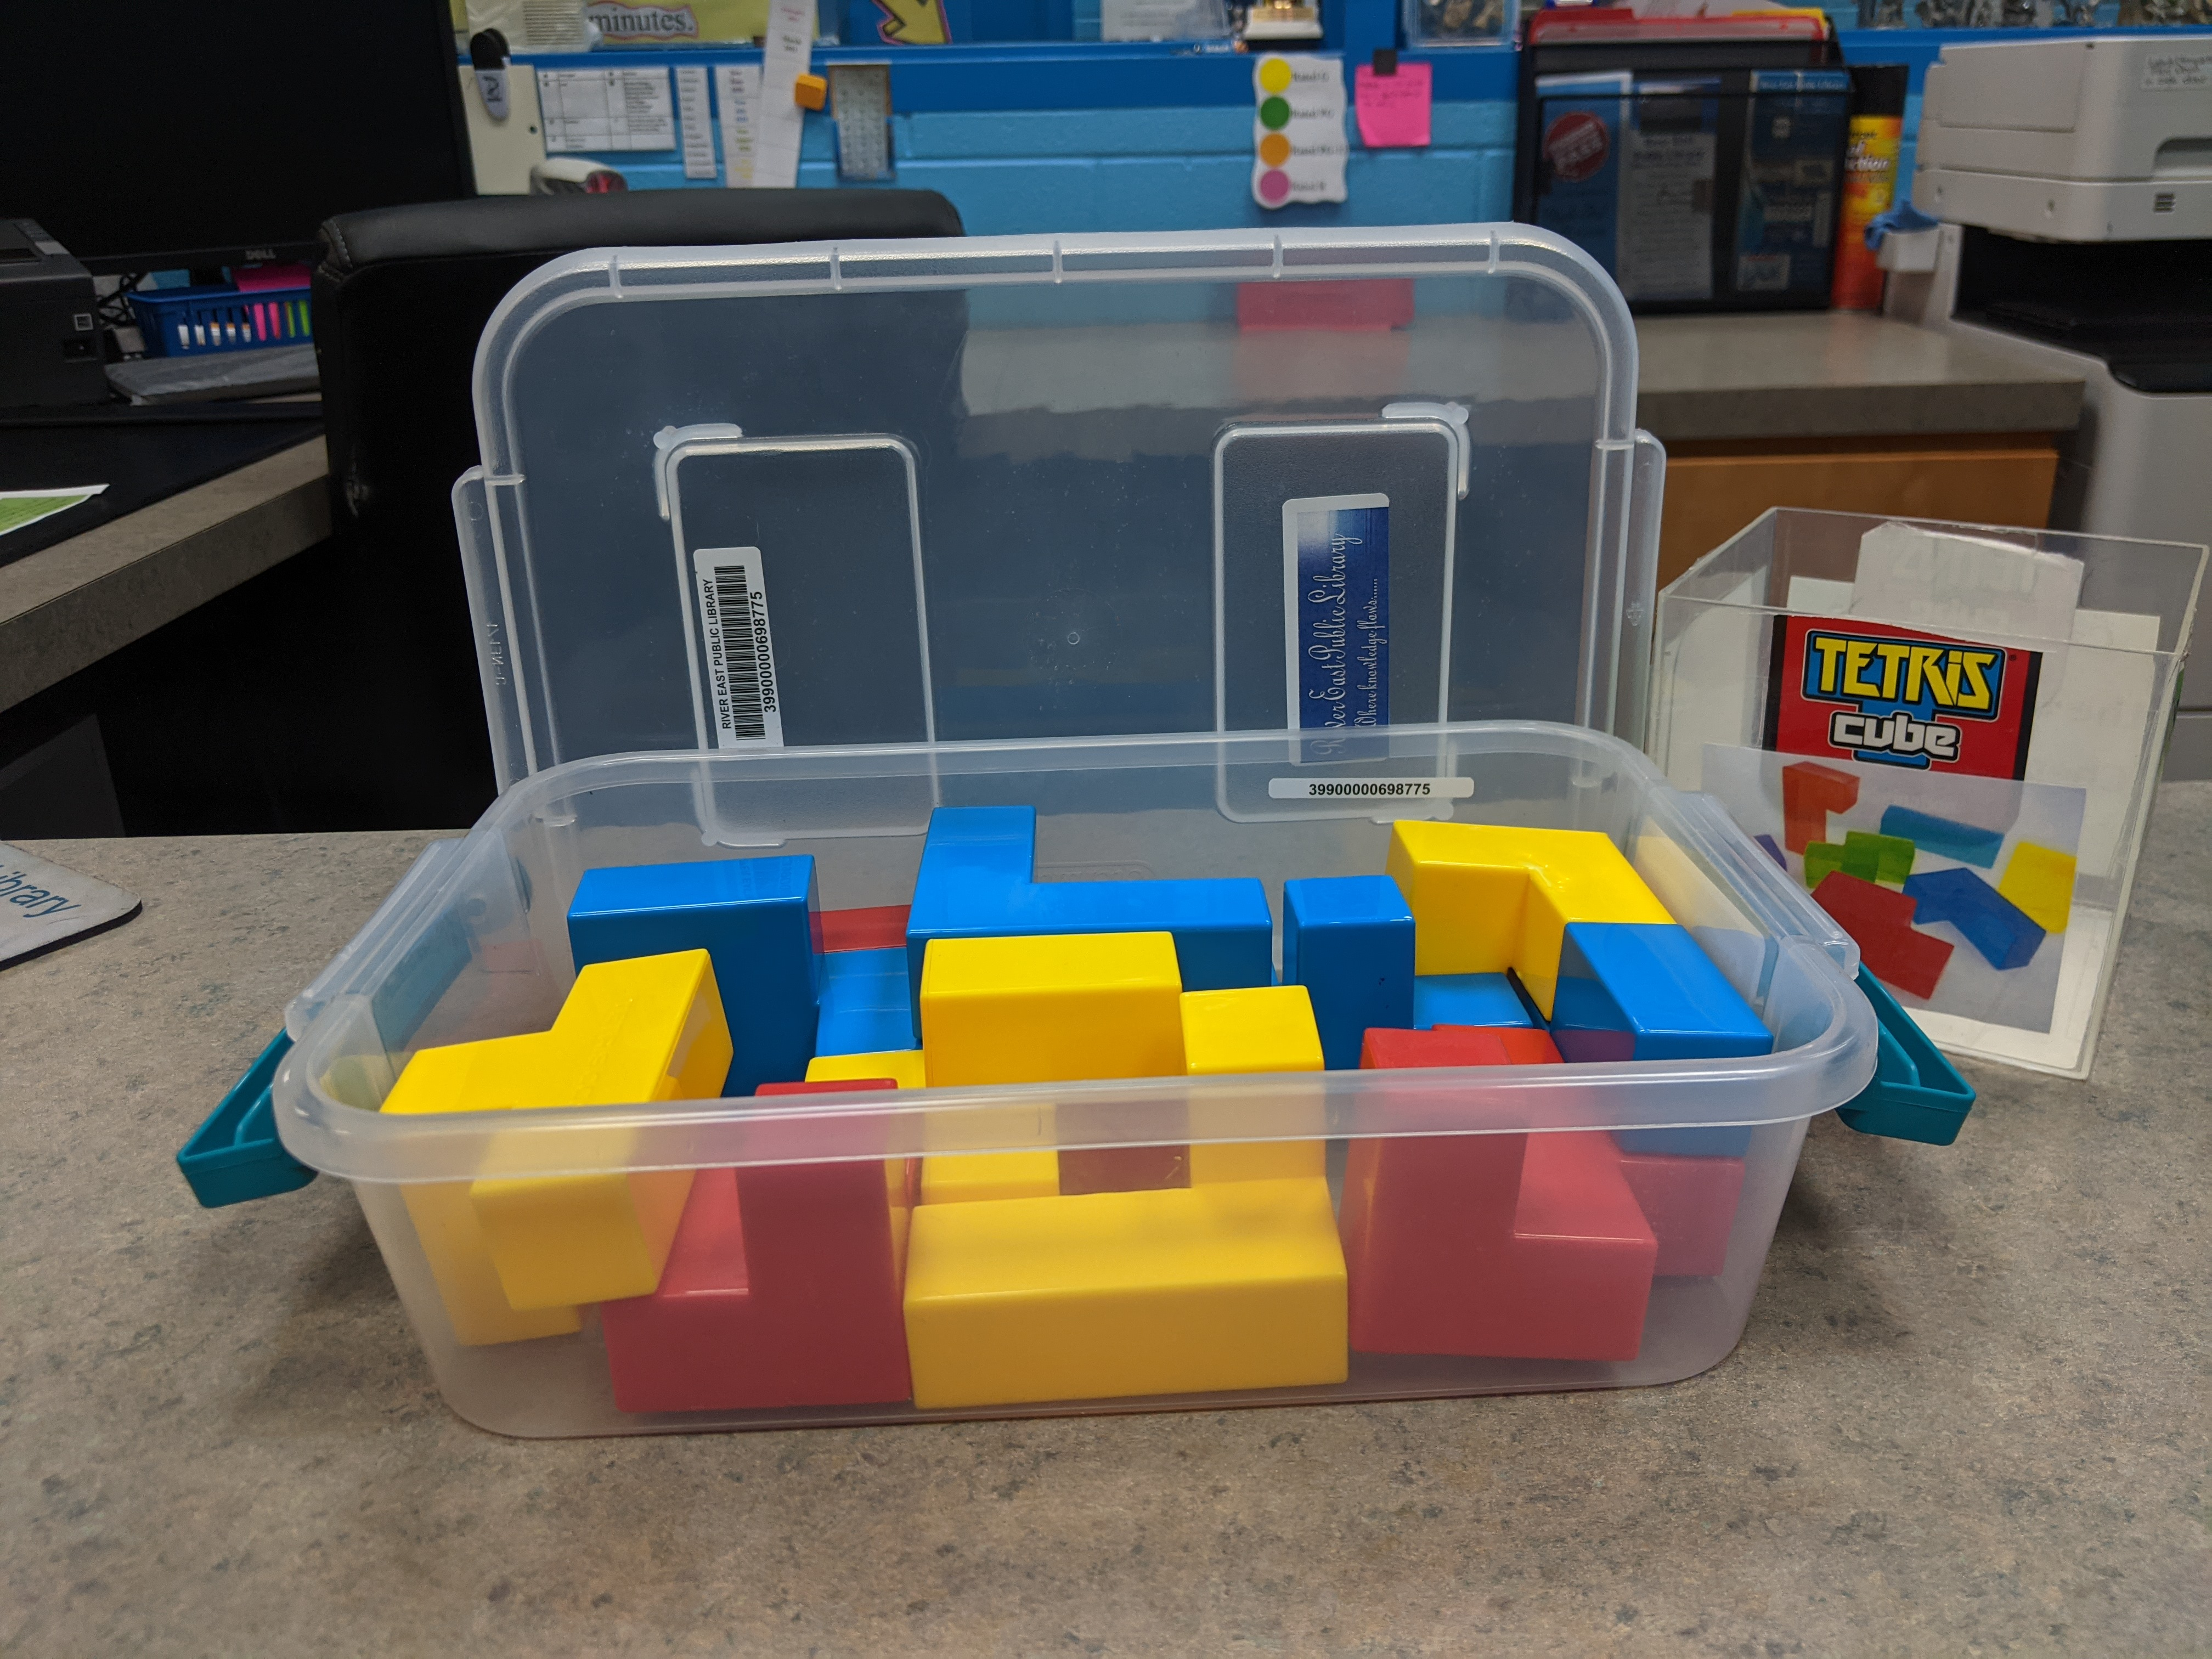 Image of Tetris Game Cube